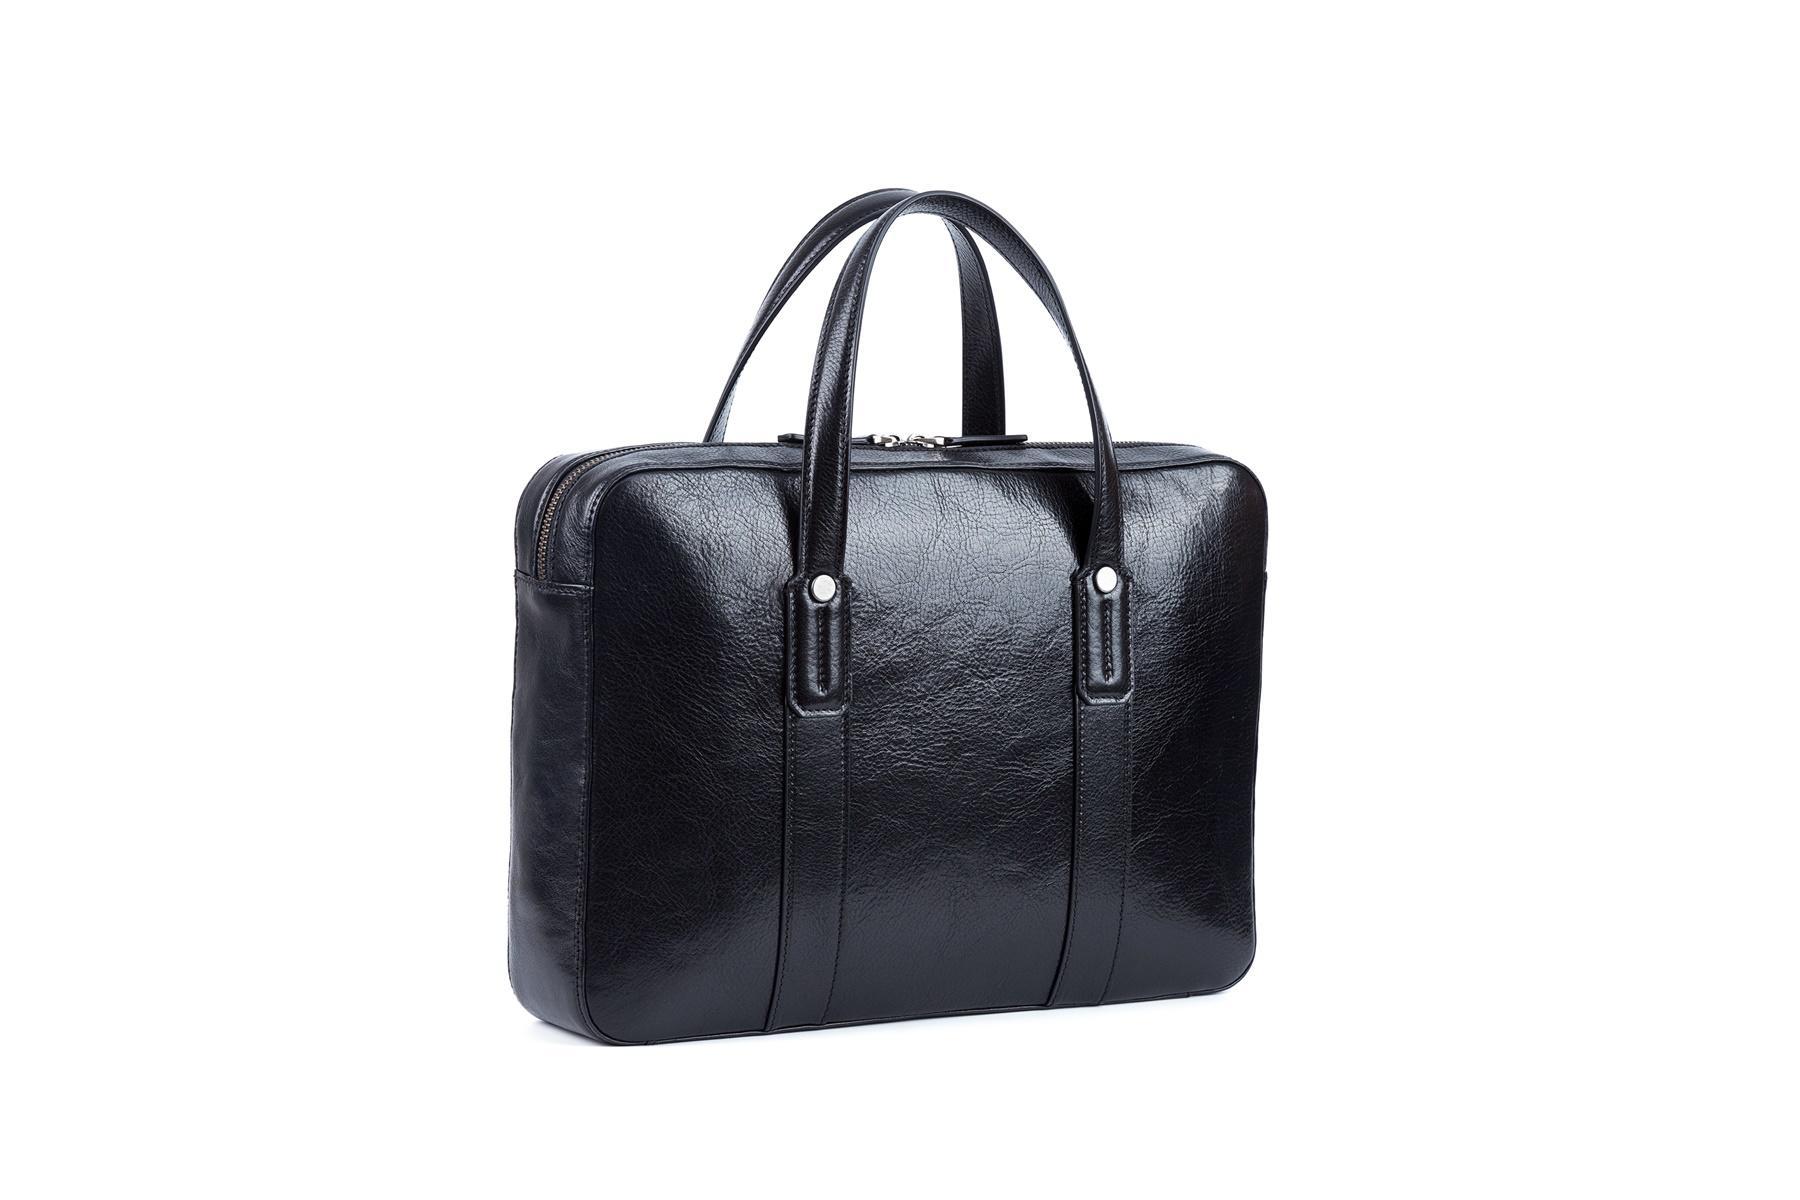 Briefcase genuine leather zipper closure simple handle